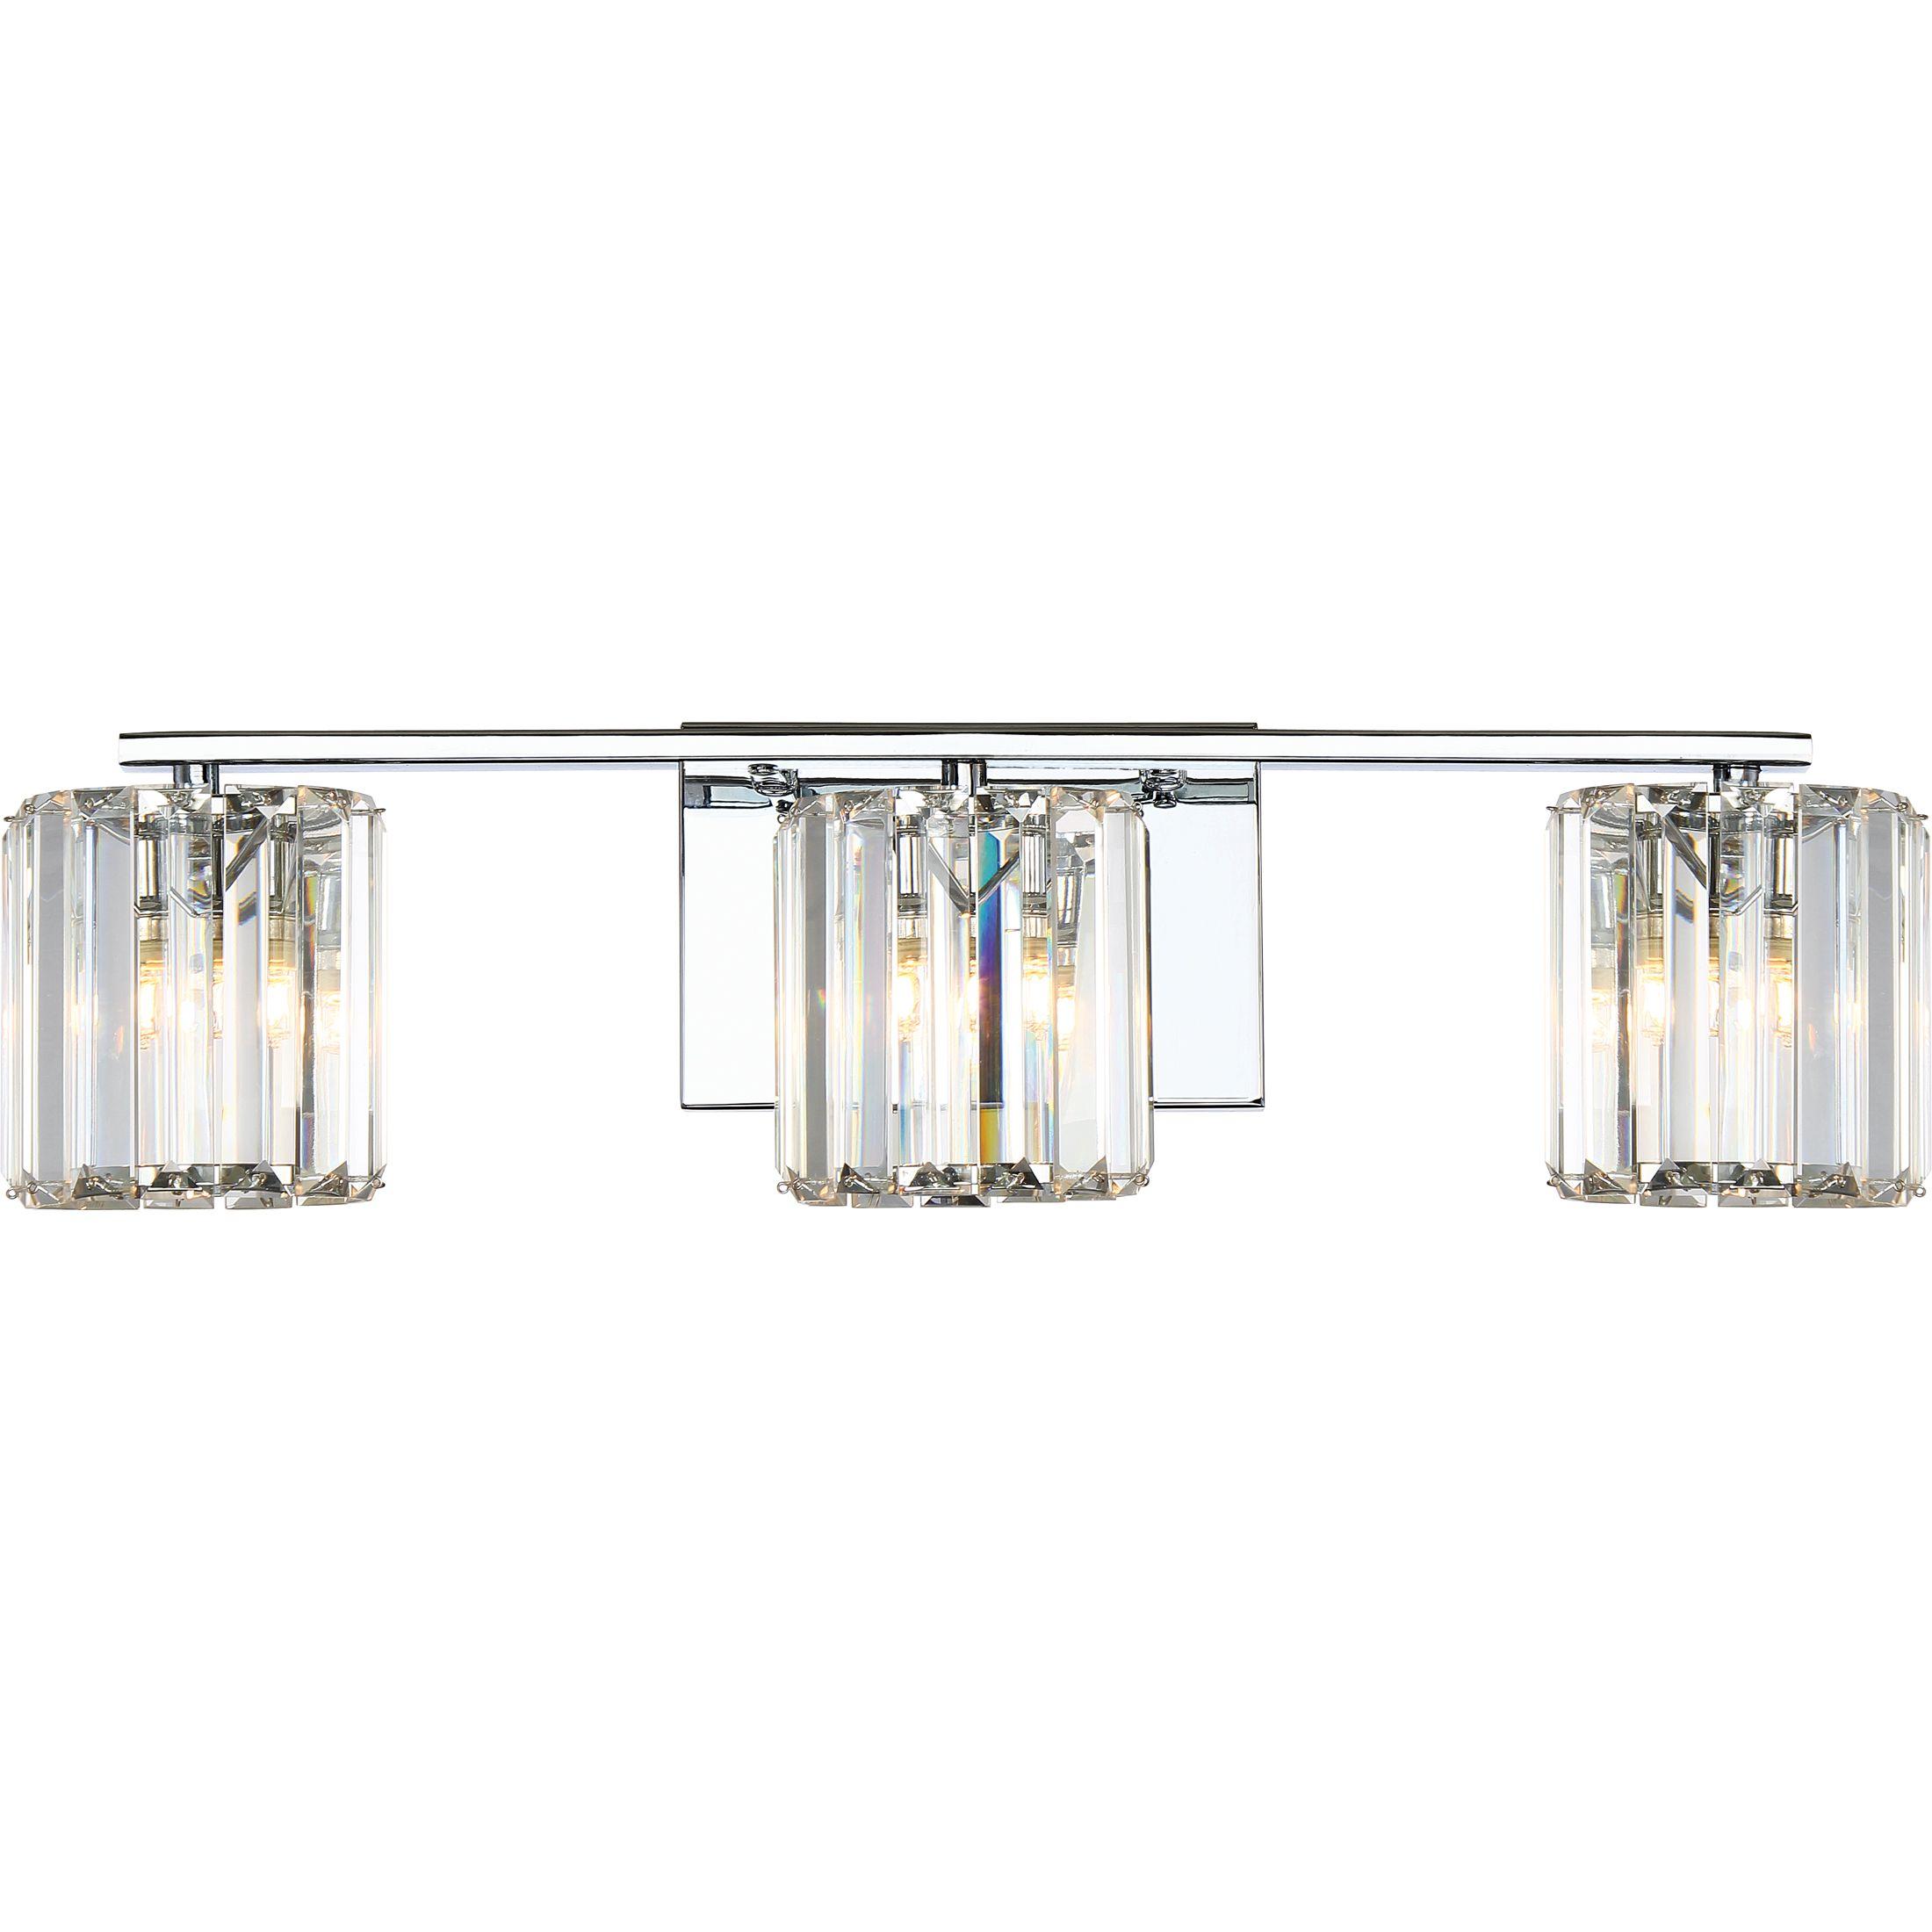 copper wells lights images fixtures vanity bathroom brushed nickel bathrooms light shower ideas adorable bath as design